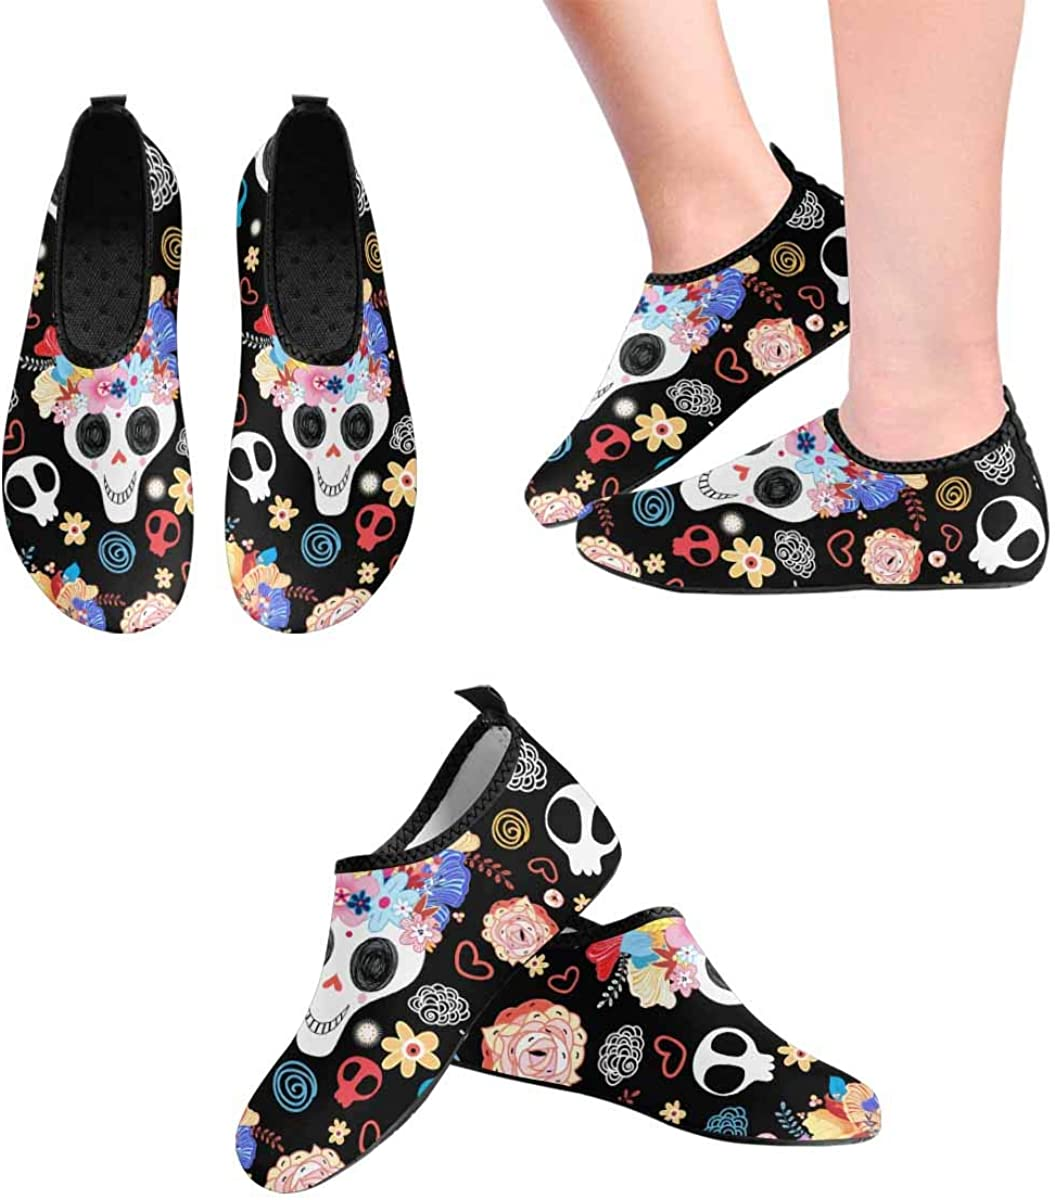 INTERESTPRINT Mens Water Shoes Beautiful Skulls Beach Swim Shoes Quick Dry Aqua Socks Pool Shoes